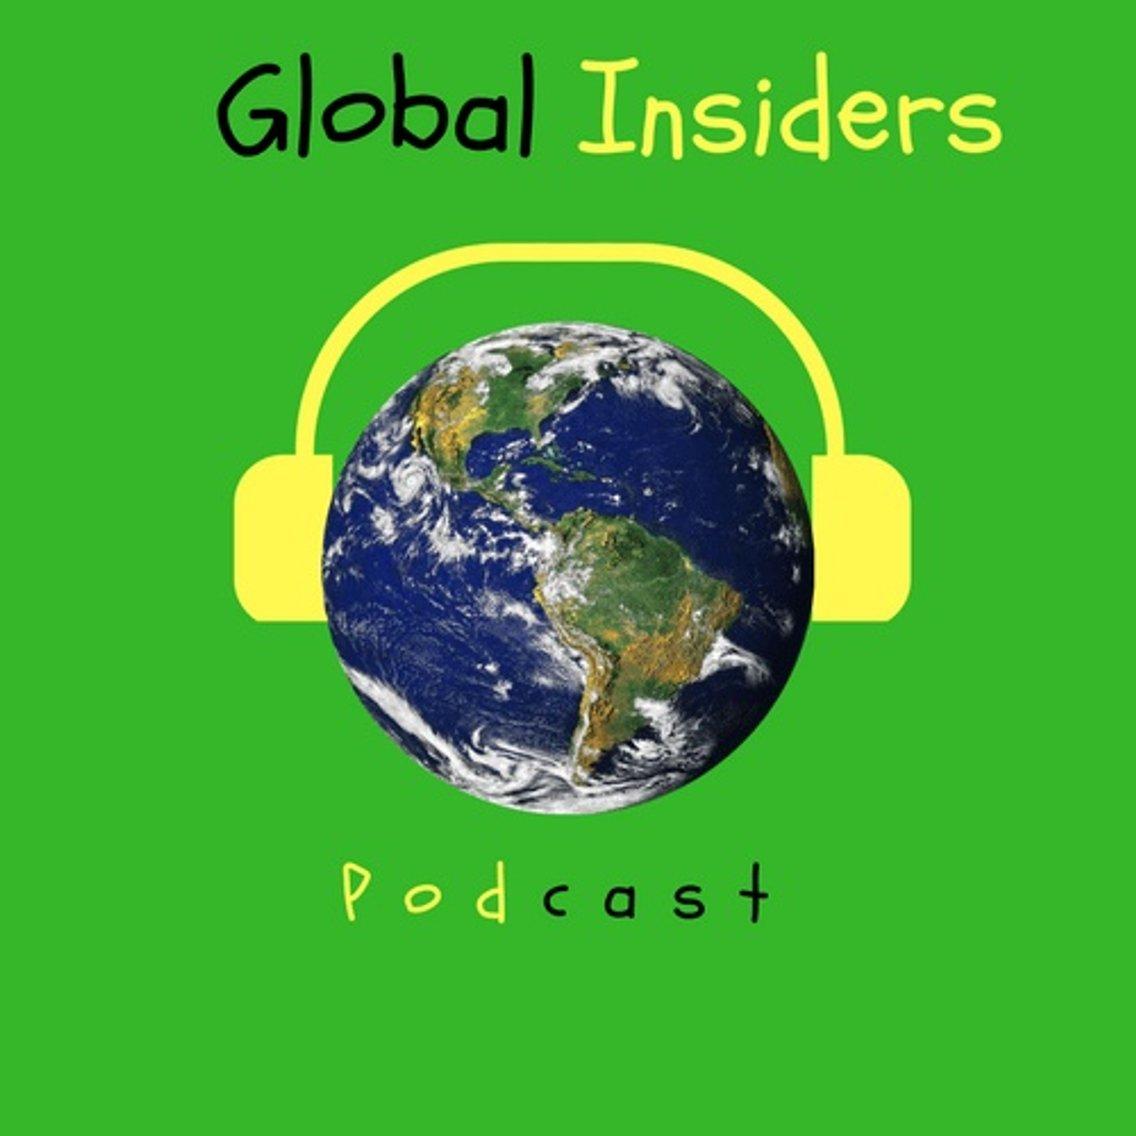 Global Insiders: Travel and Work - immagine di copertina